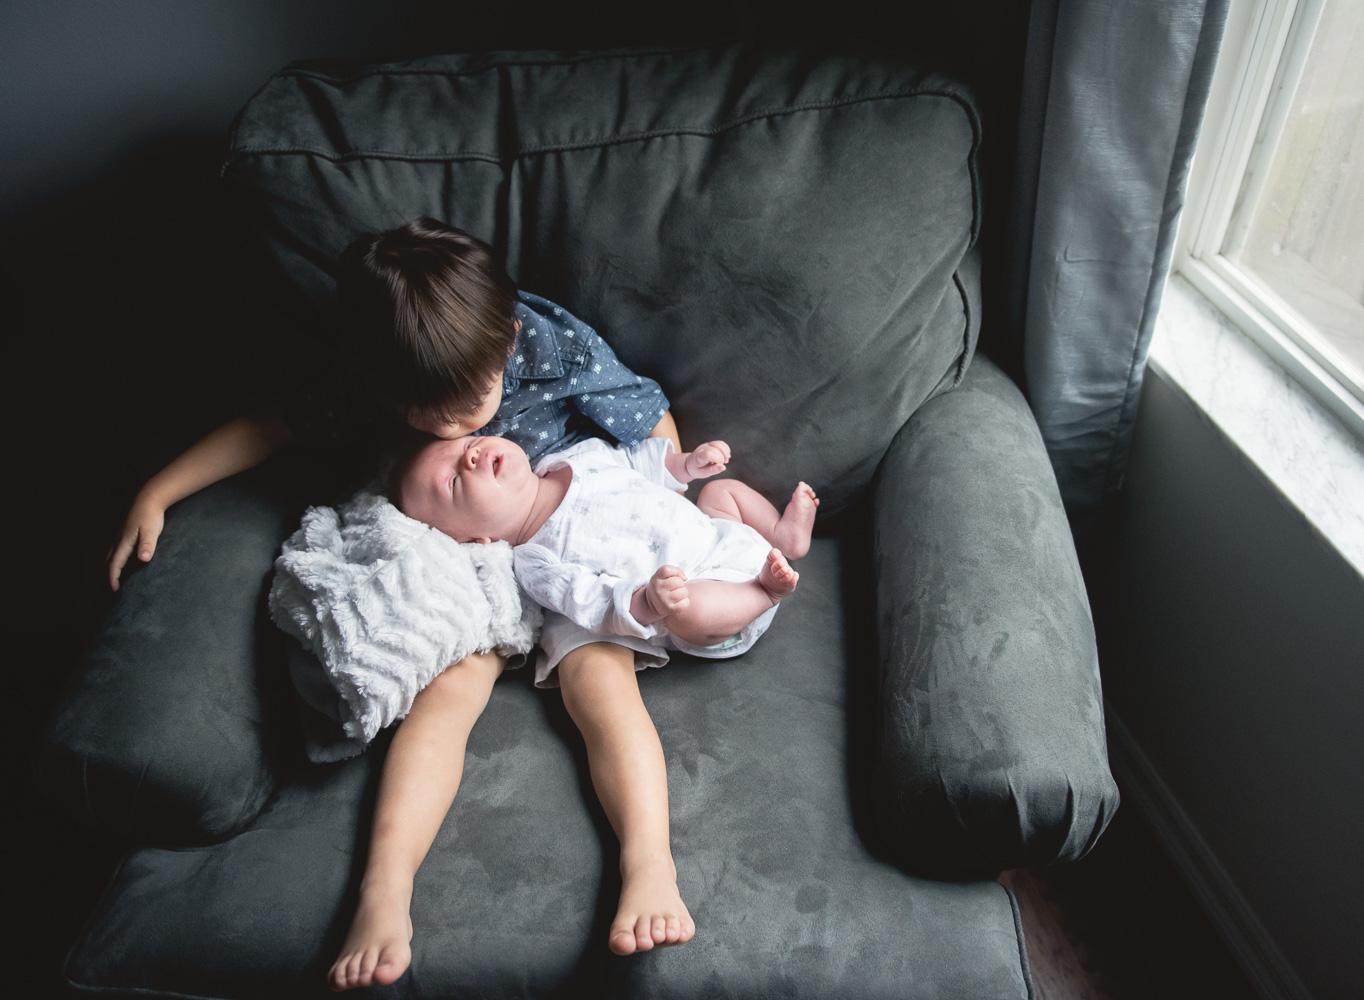 Apopka-Newborn-Sendros-Erika-Reiner-Photography (6 of 33).jpg